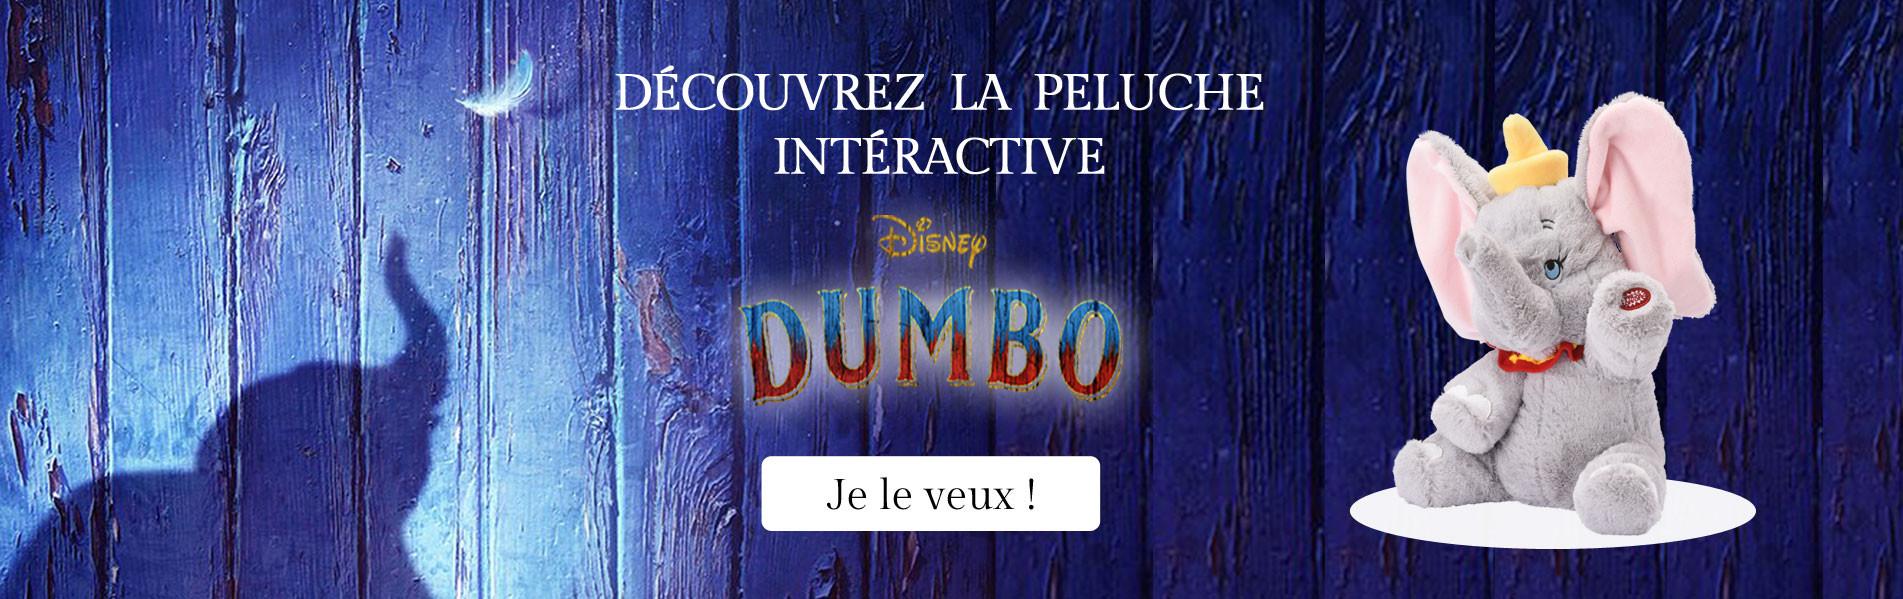 La Peluche interactive Dumbo